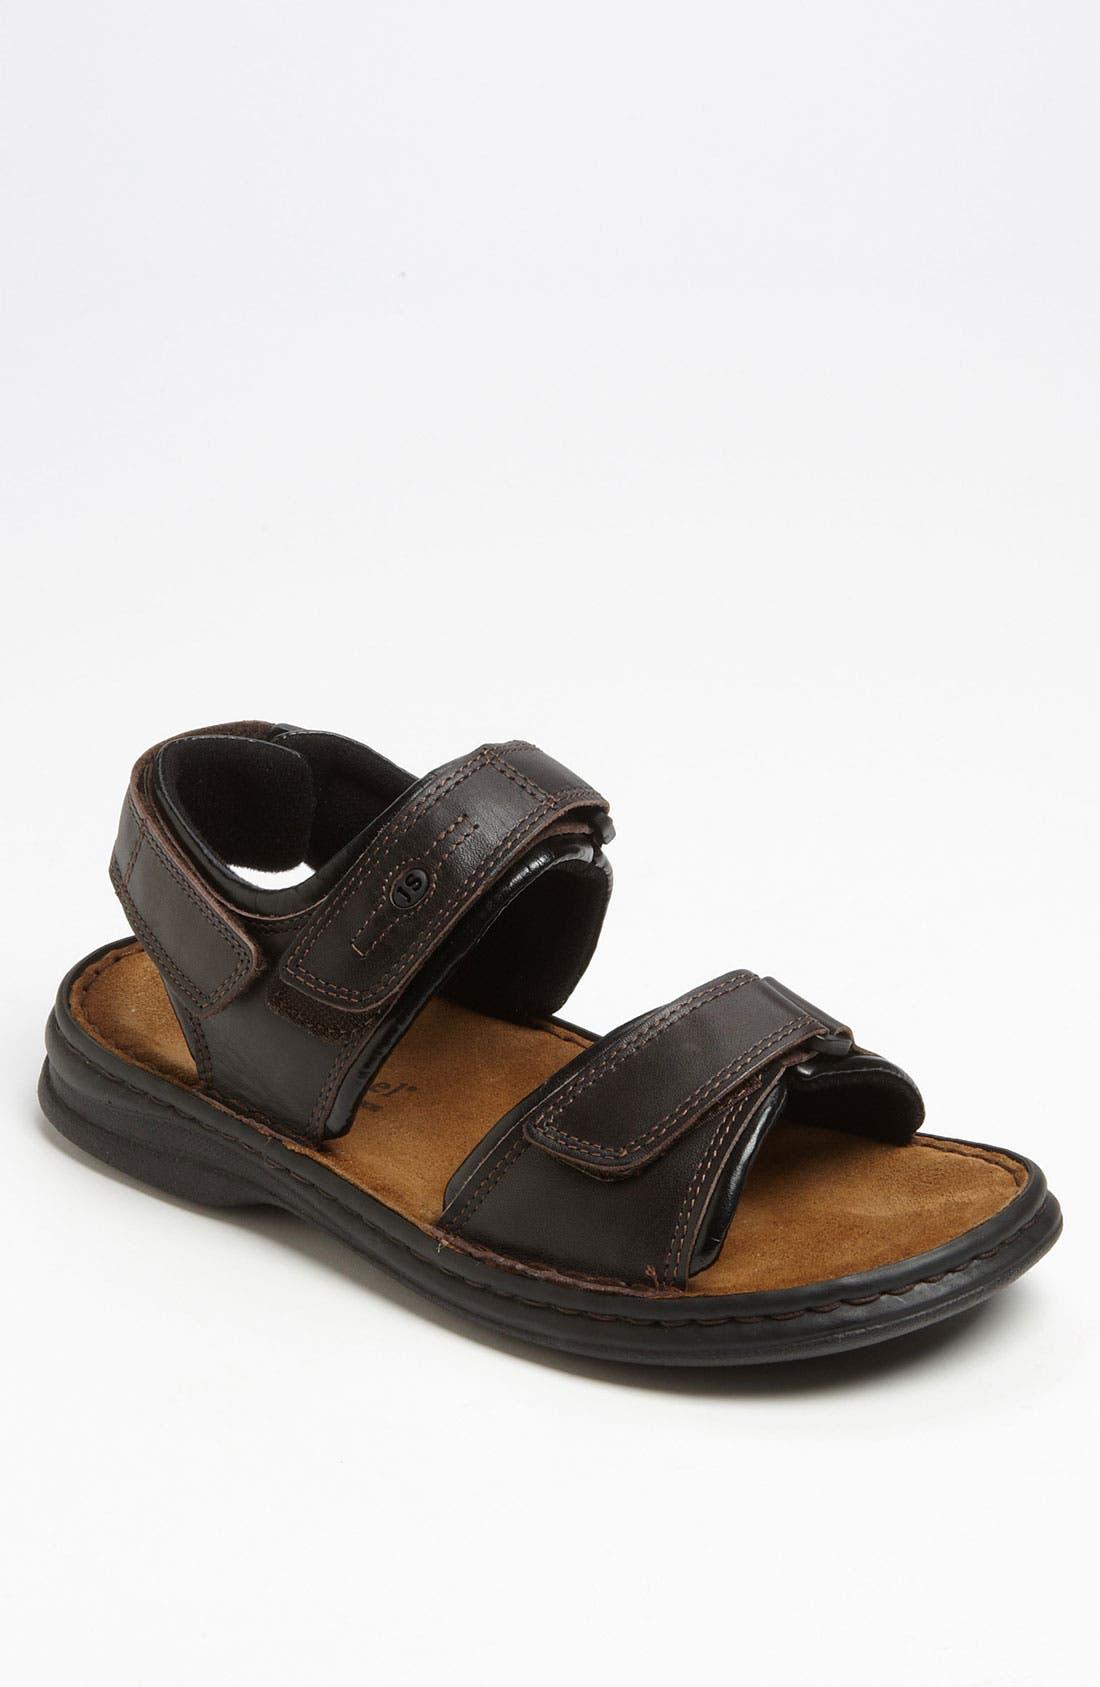 'Rafe' Sandal,                         Main,                         color, Dakota Moro/Black